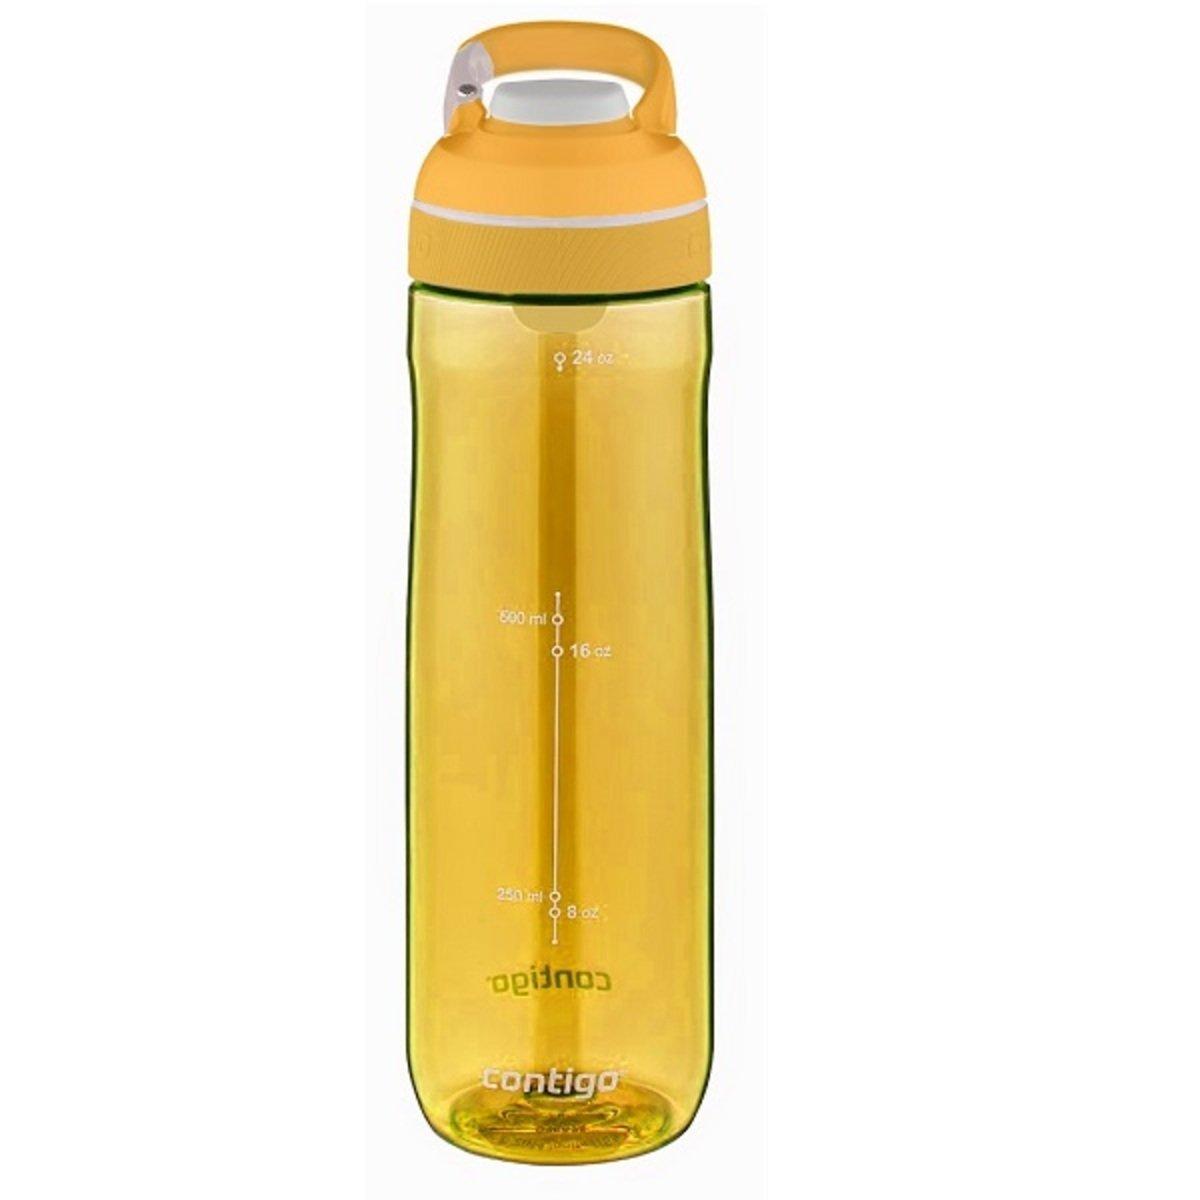 Cortland 運動偷閒杯 - 金黃色